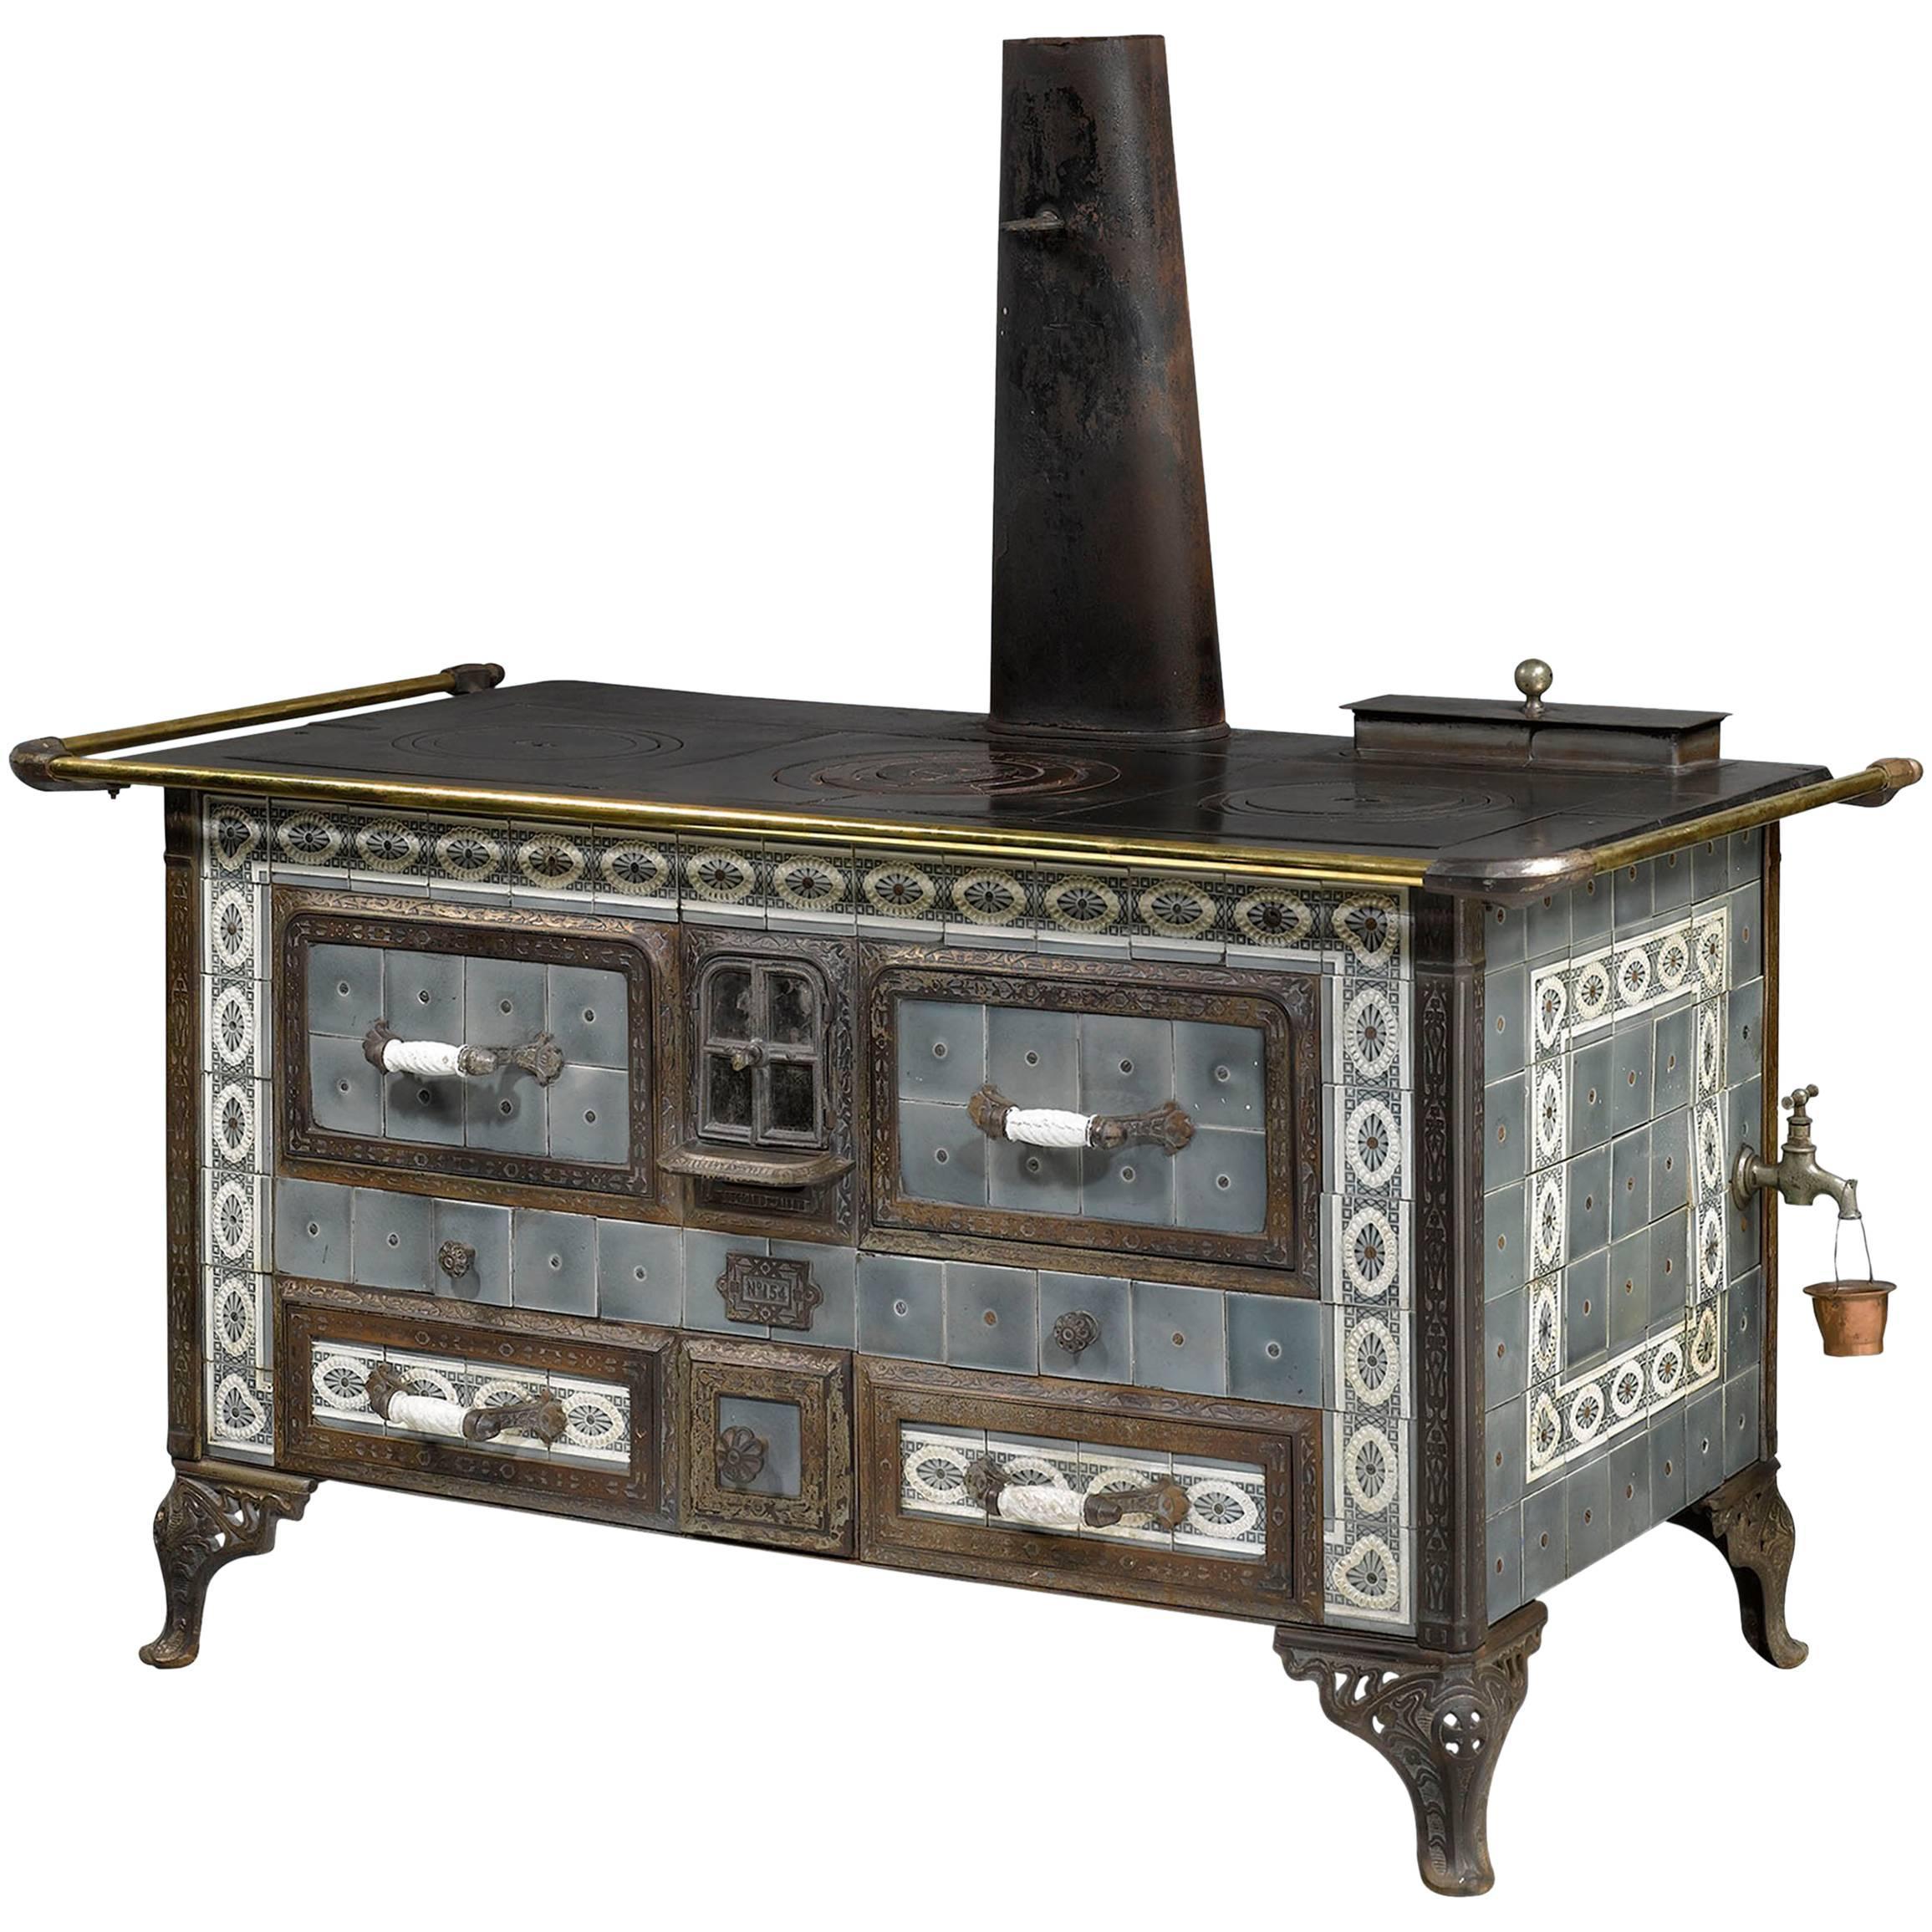 19th Century Sougland-Aisne Stored Heat Cook Stove